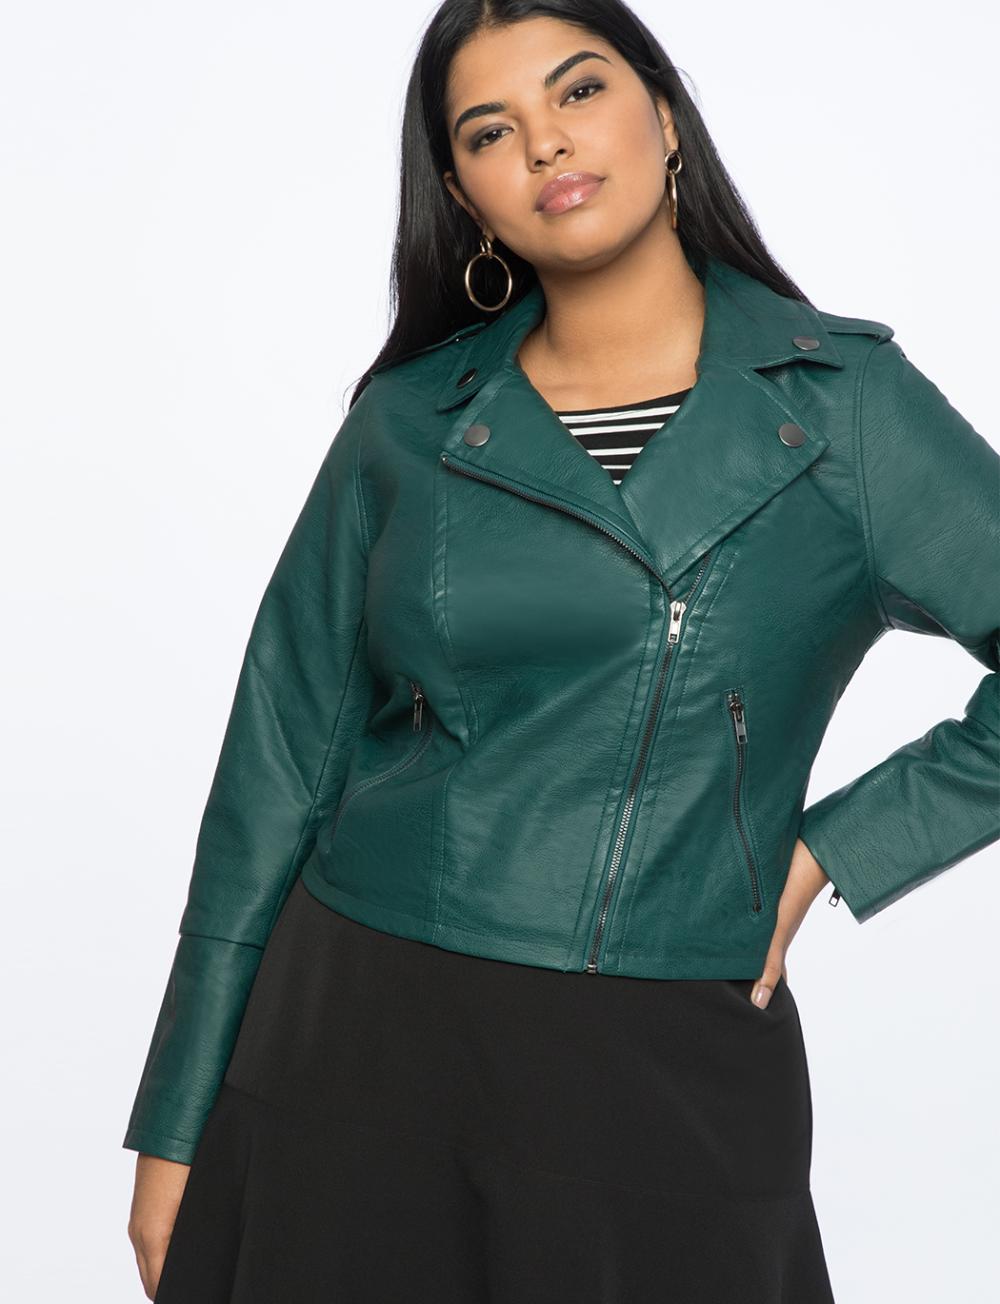 Faux Leather Moto Jacket Women S Plus Size Coats Jackets Eloquii Womens Moto Jacket Plus Size Spring Dresses Leather Moto Jacket Womens [ 1304 x 1000 Pixel ]